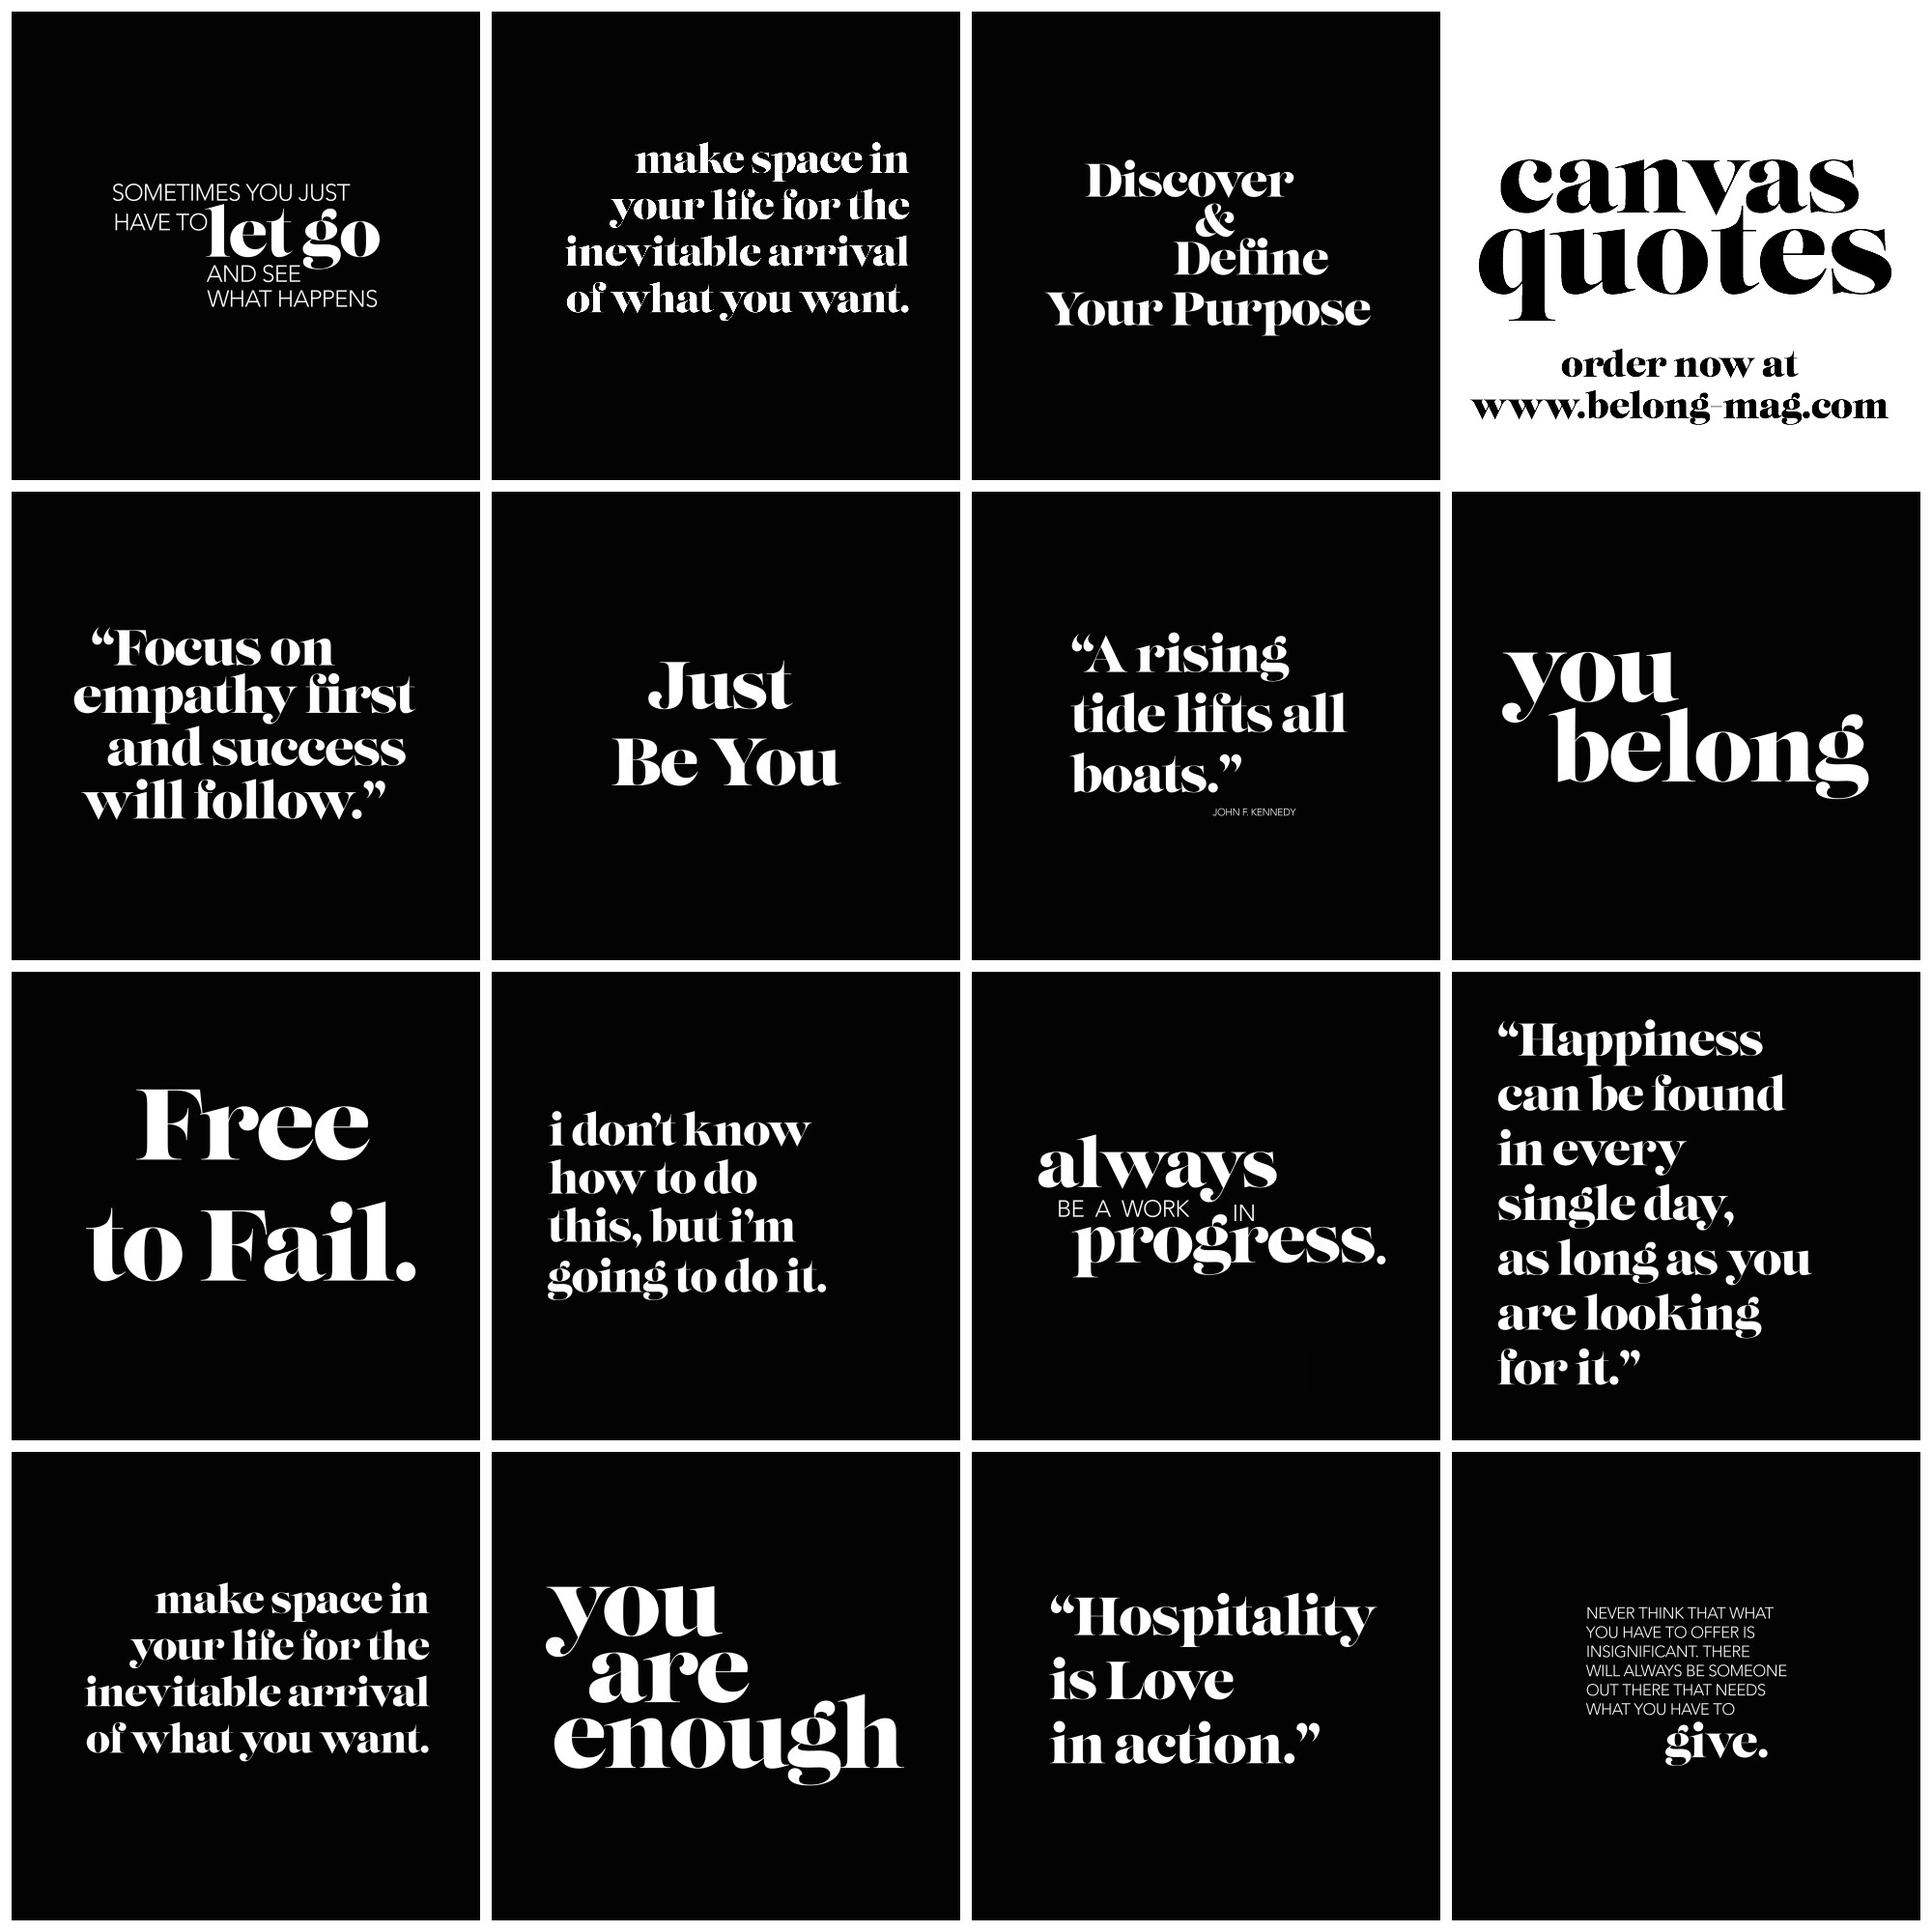 belong magazine instagram quotes on canvas